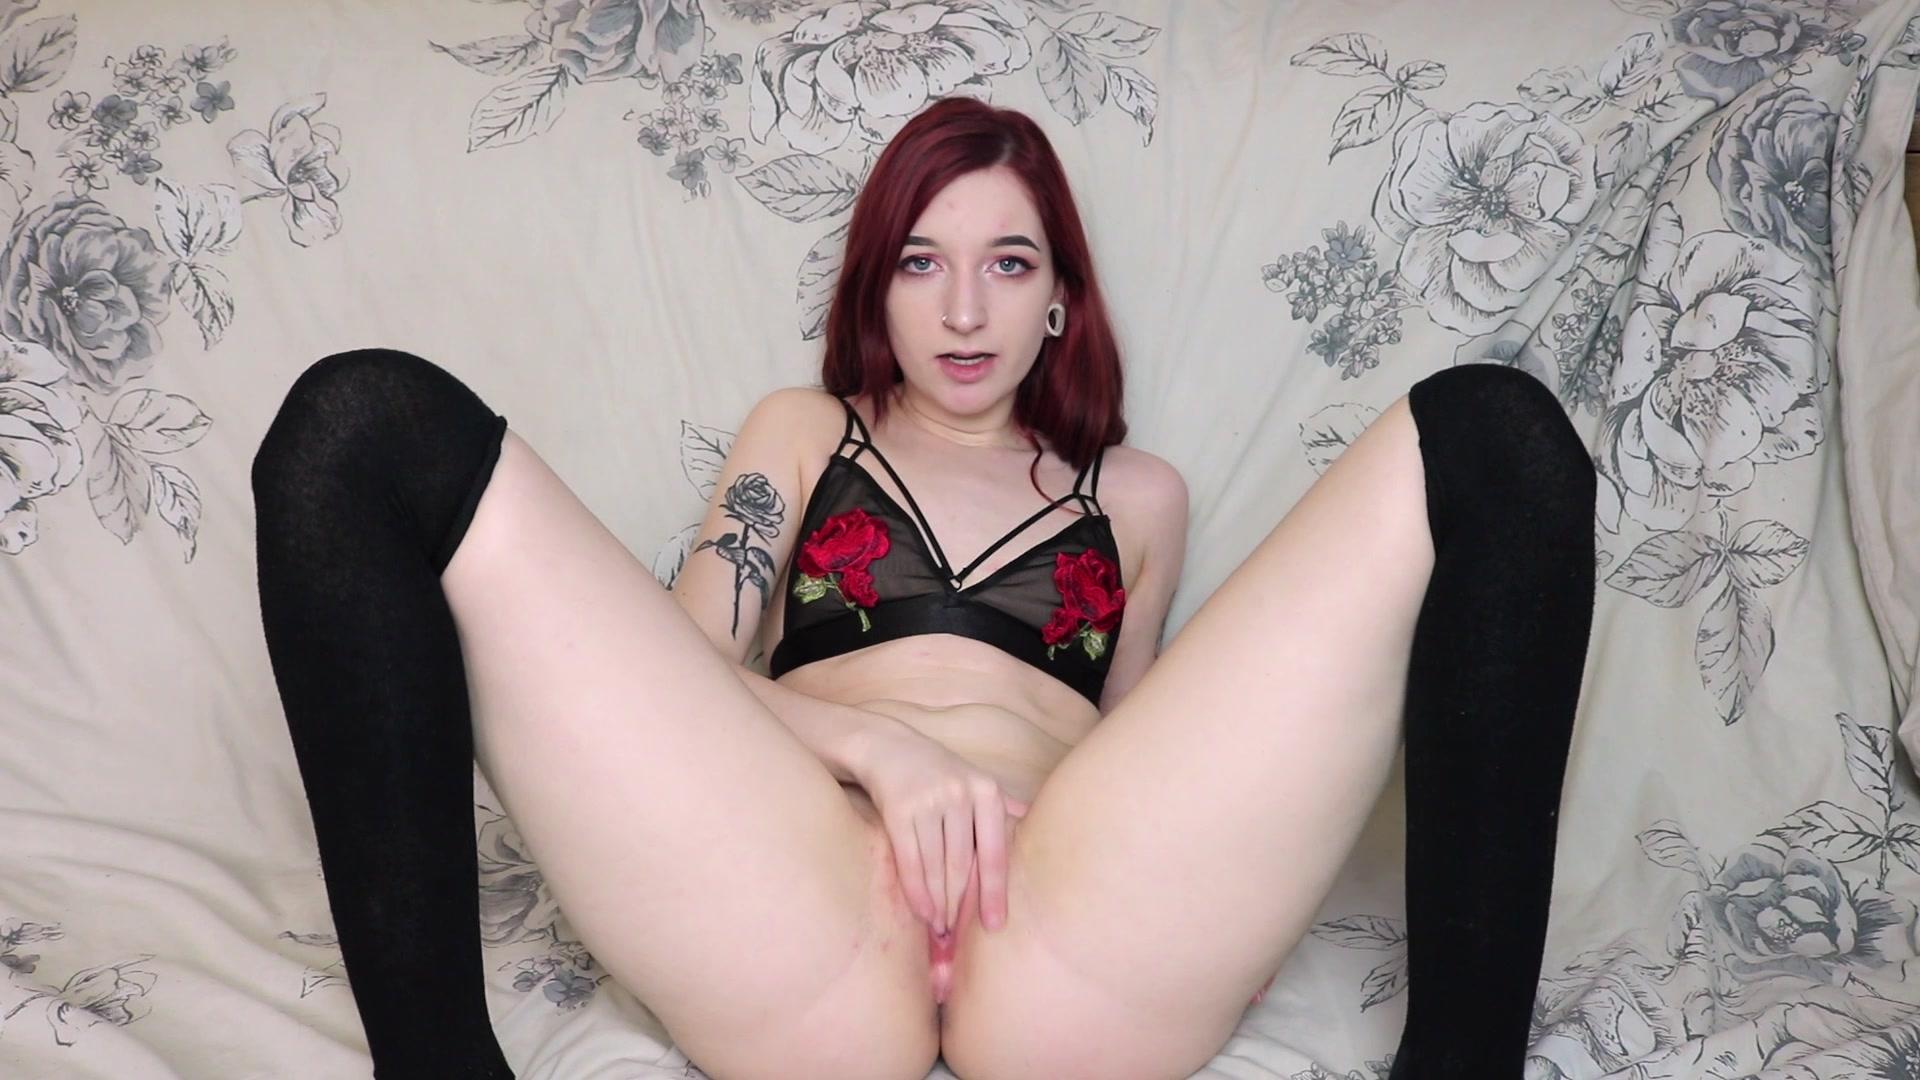 BustyBrunete rubs her pussy